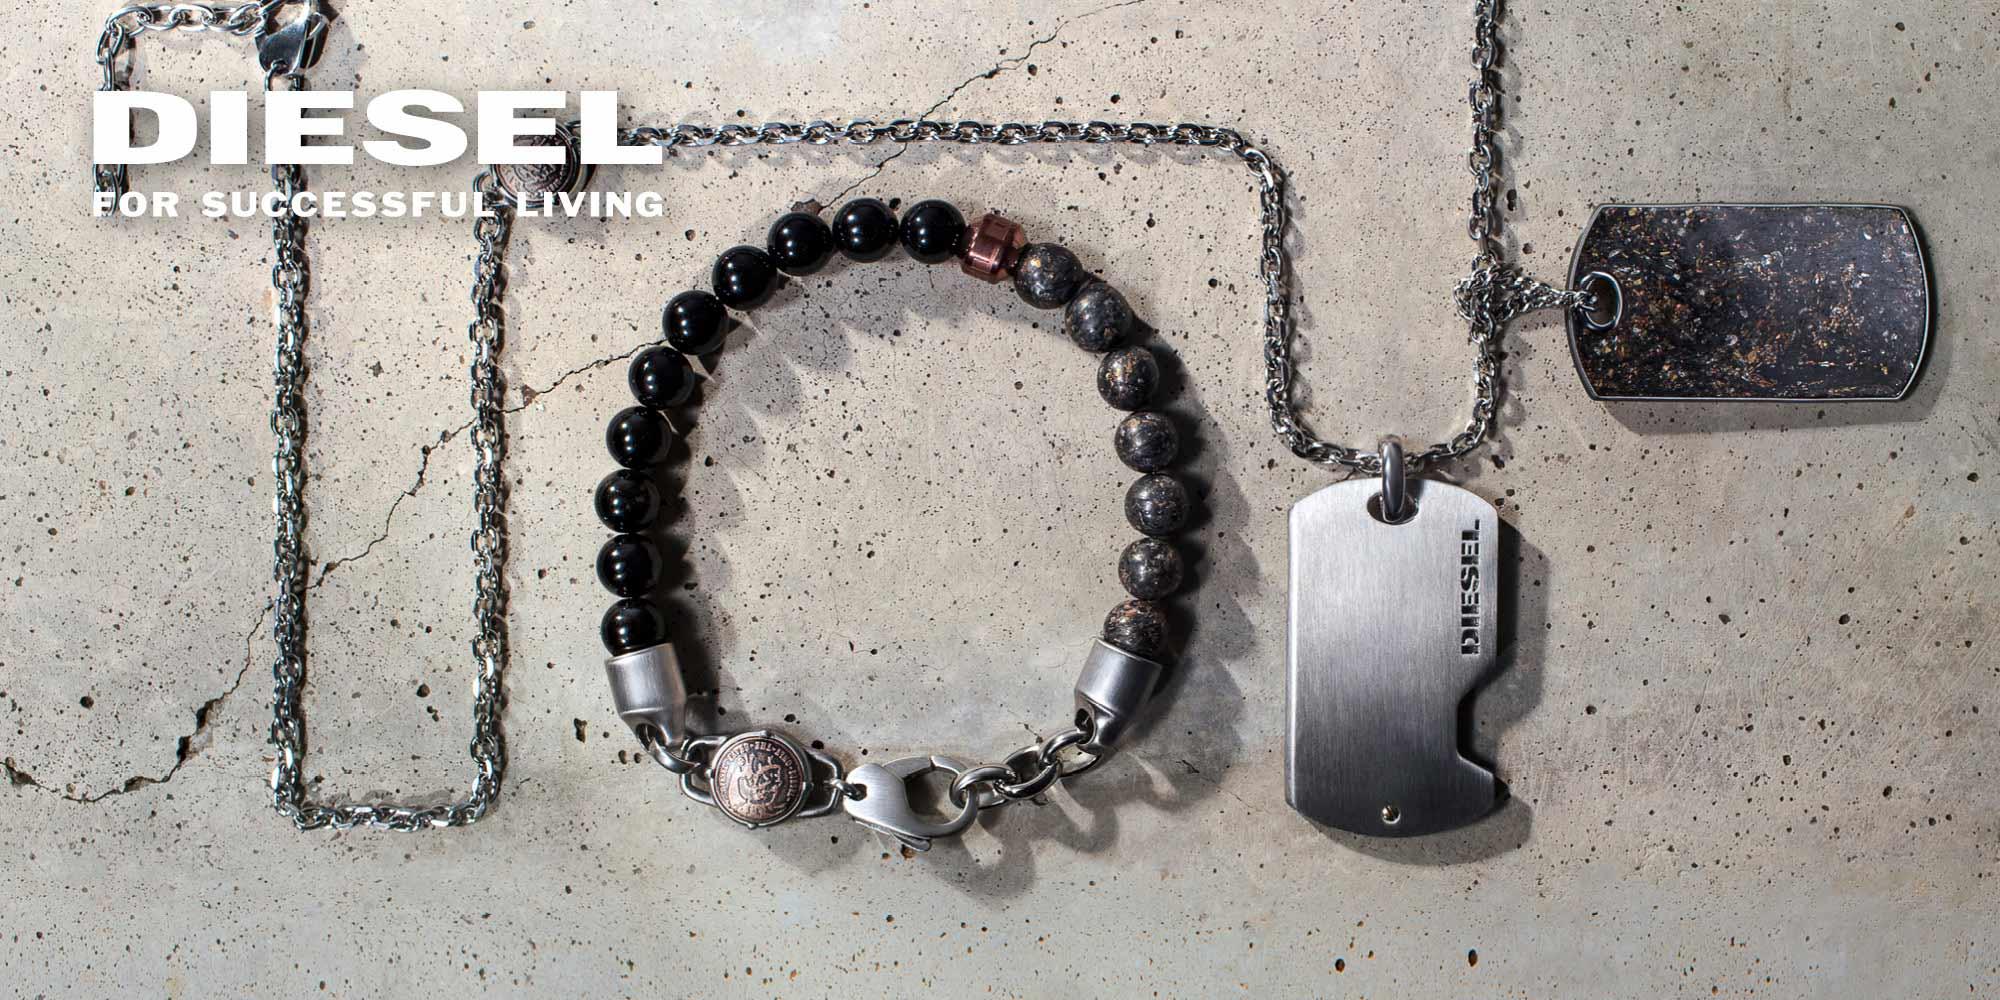 bijoux montre diesel homme pas cher sur bijourama. Black Bedroom Furniture Sets. Home Design Ideas